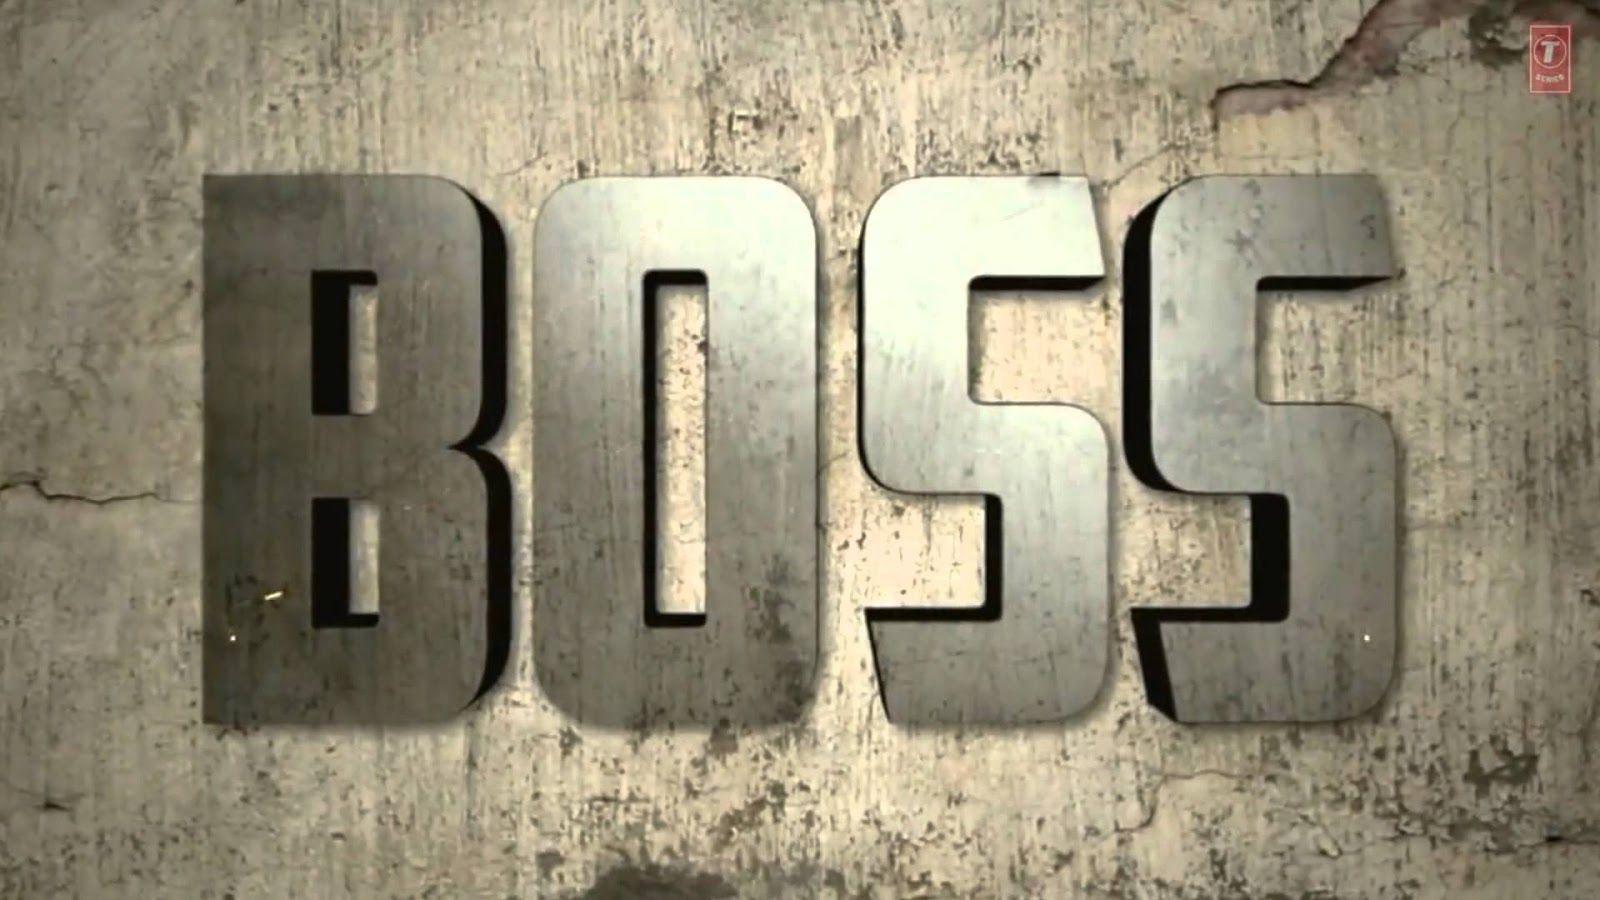 Boss Wallpapers - Top Free Boss Backgrounds - WallpaperAccess